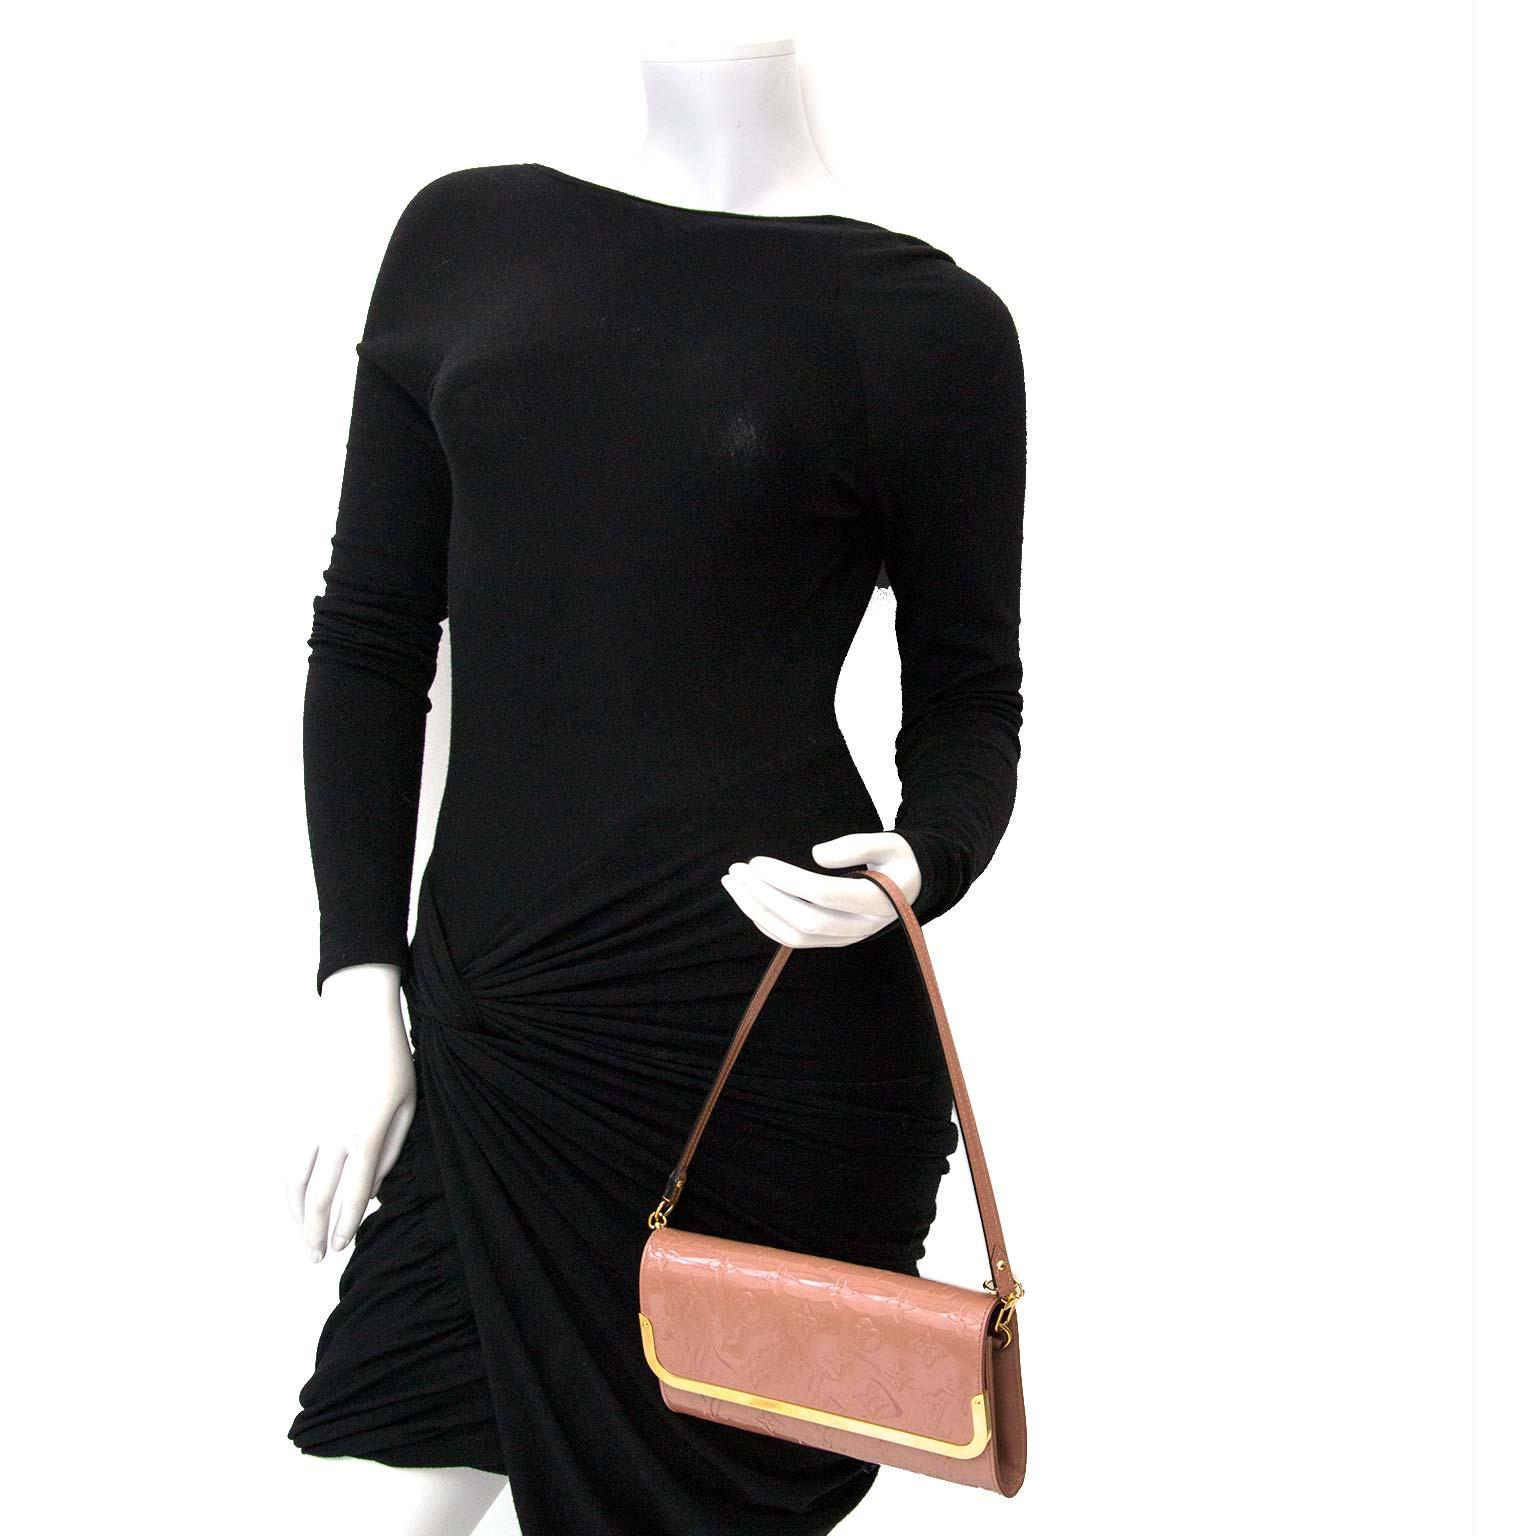 Buy your authentic Louis Vuitton Rose Velours Monogram Vernis Rossmore Shoulder Bag